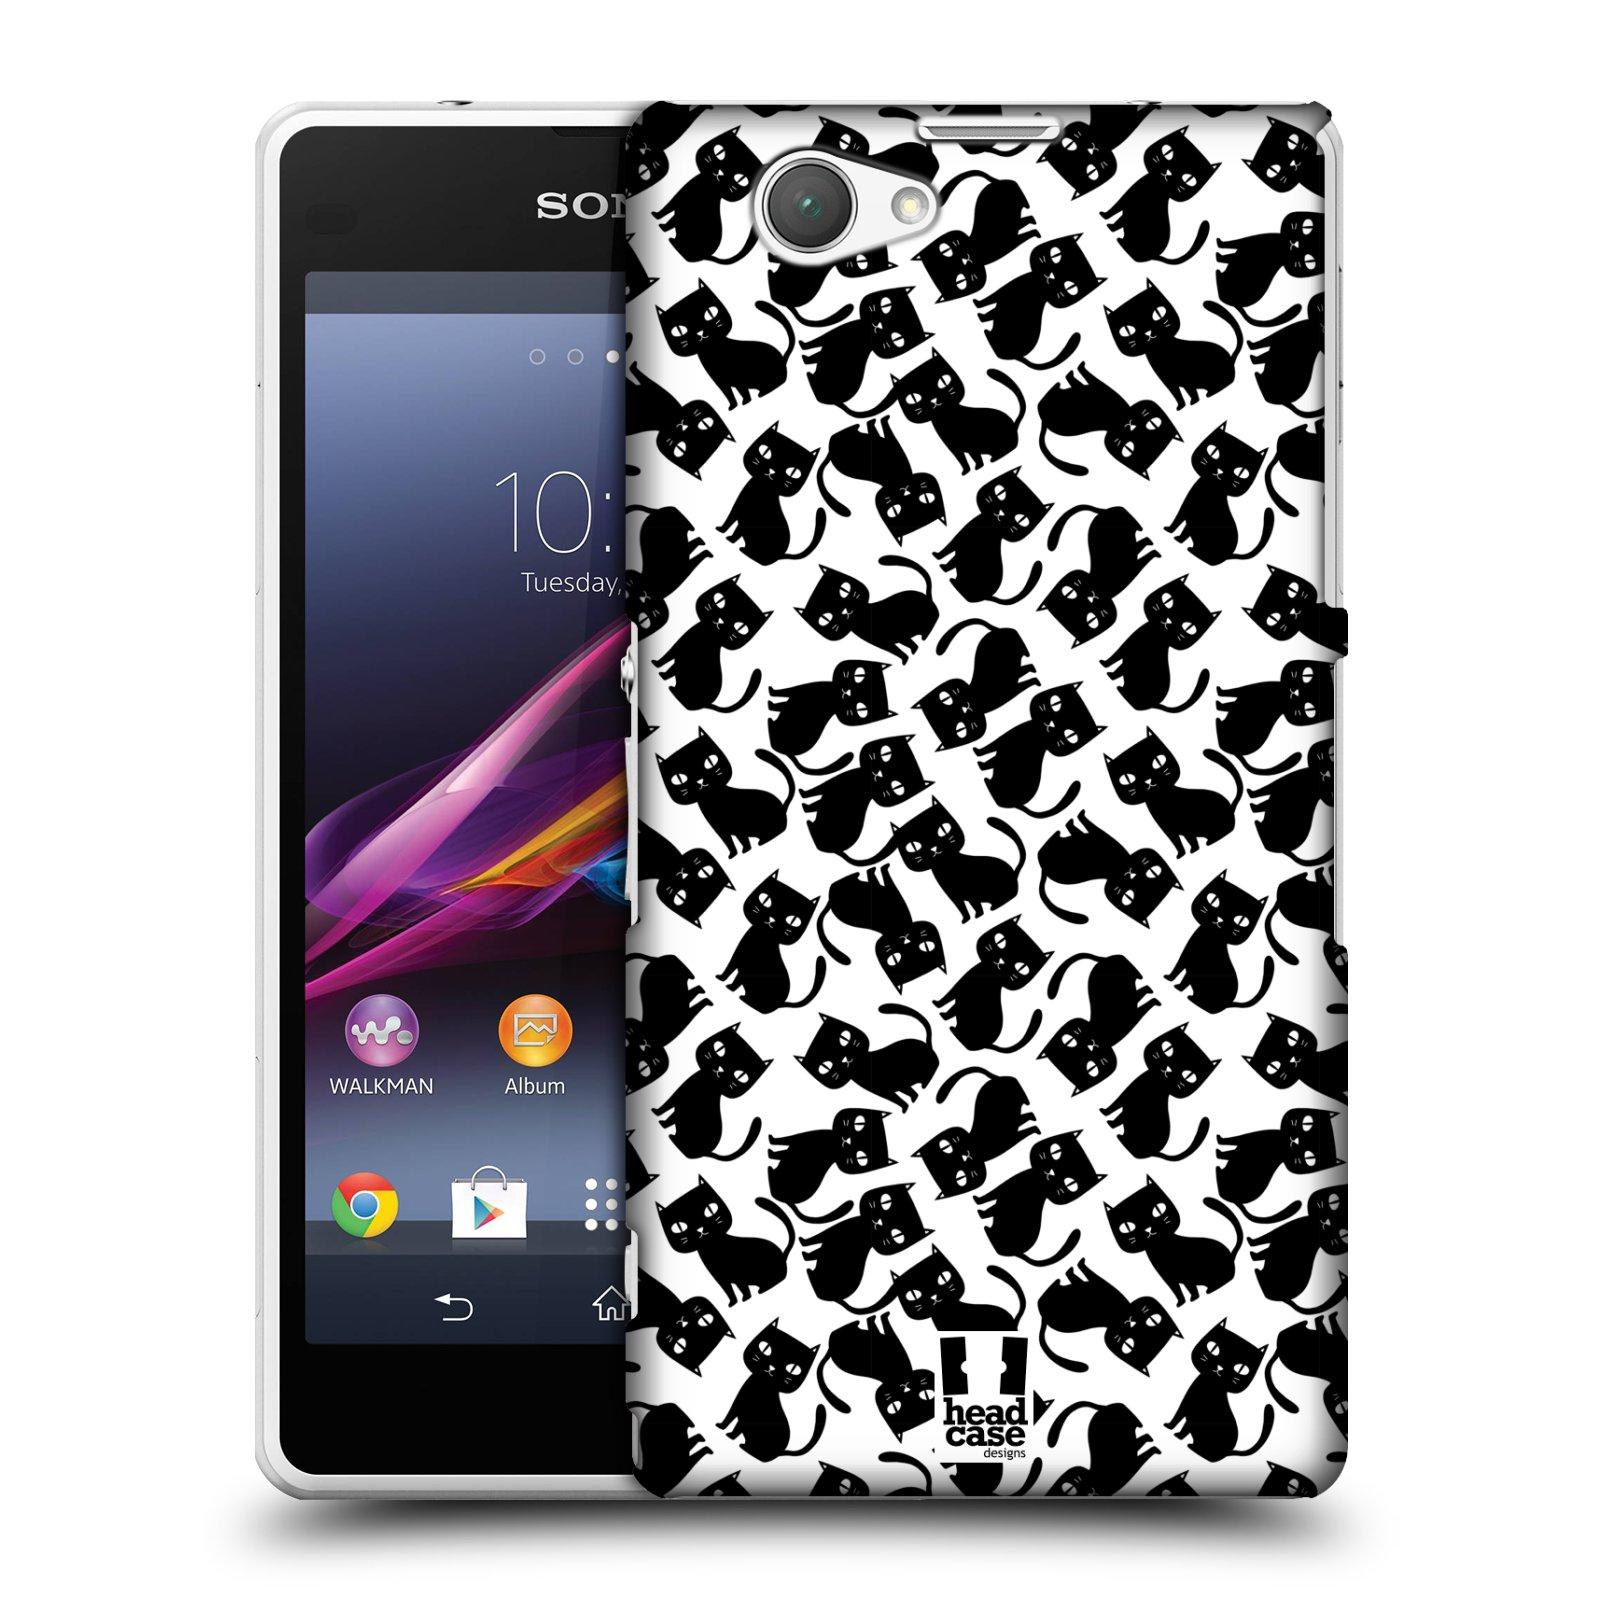 Plastové pouzdro na mobil Sony Xperia Z1 Compact D5503 HEAD CASE KOČKY Black Pattern (Kryt či obal na mobilní telefon Sony Xperia Z1 Compact )